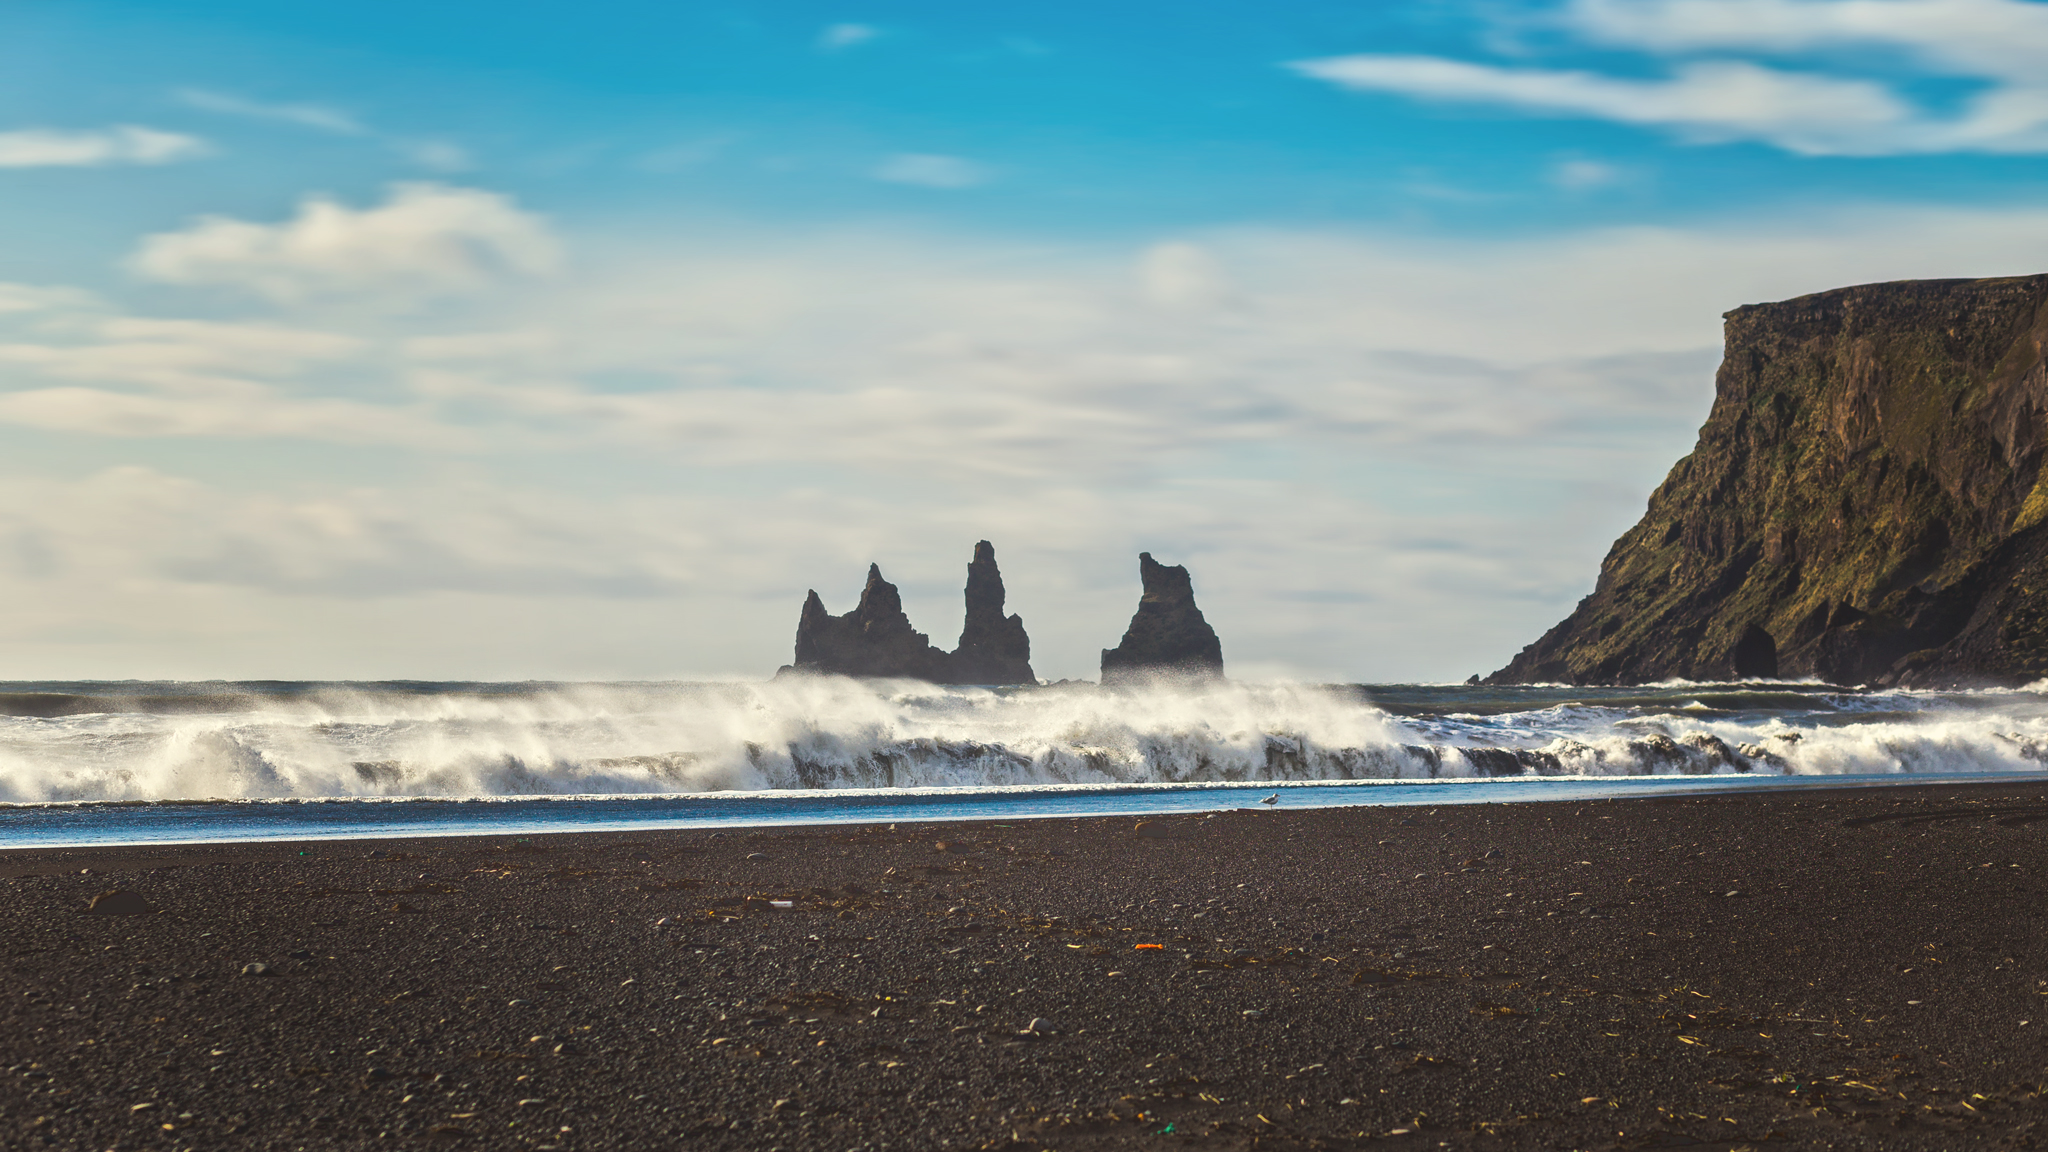 vik, iceland, jennifer picard photography, travel photographer